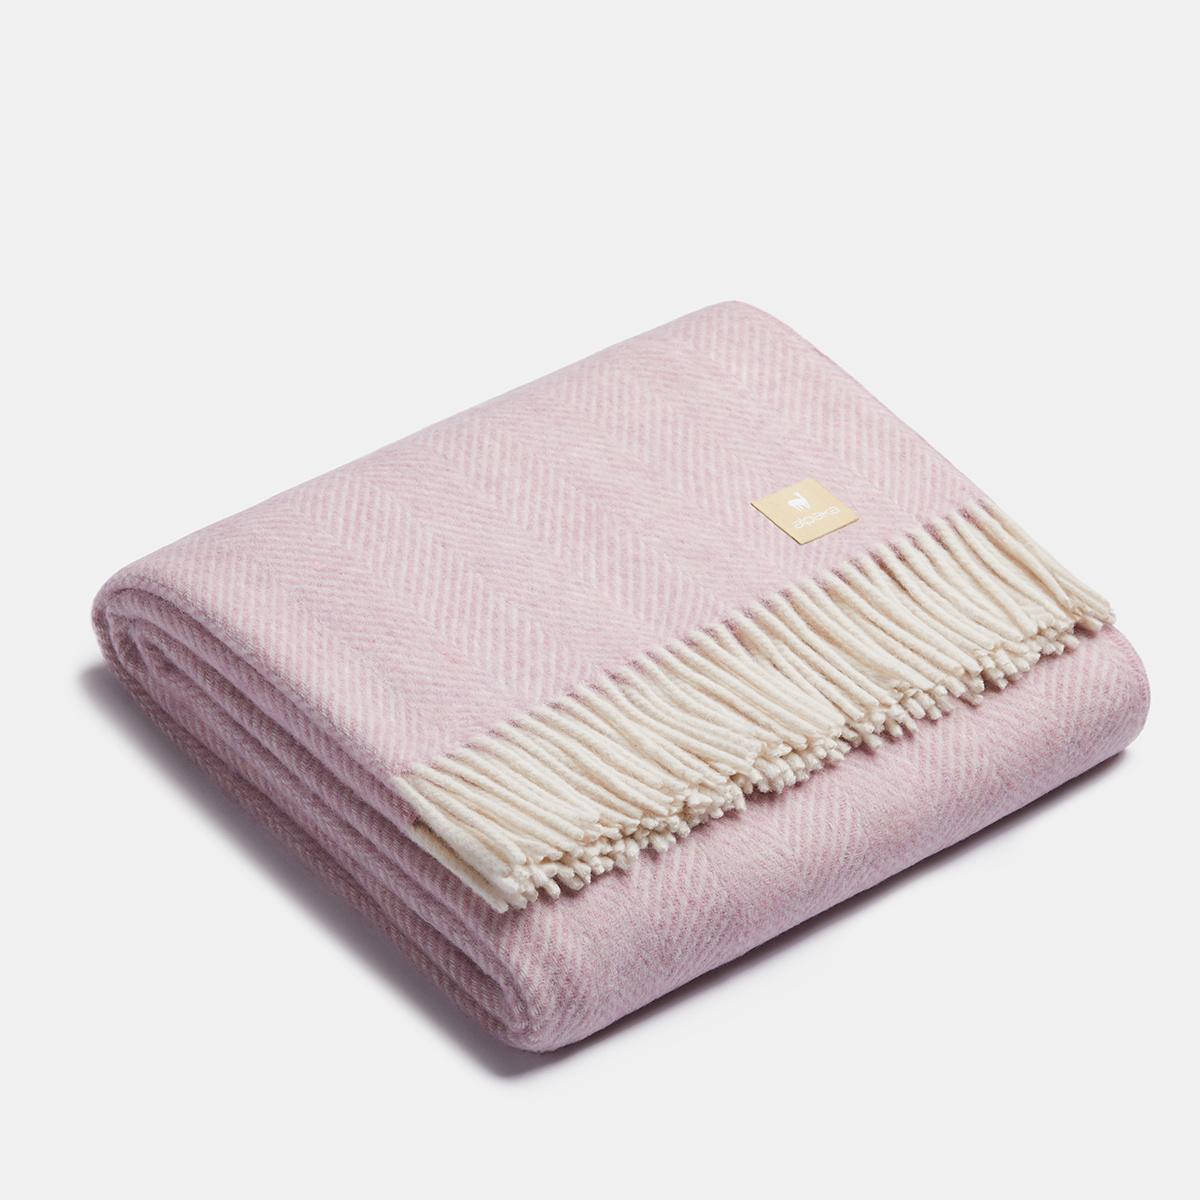 ALPAKA - Classic Fishbone - Alpaca-woolen Plaid – Pink/White – 150x200